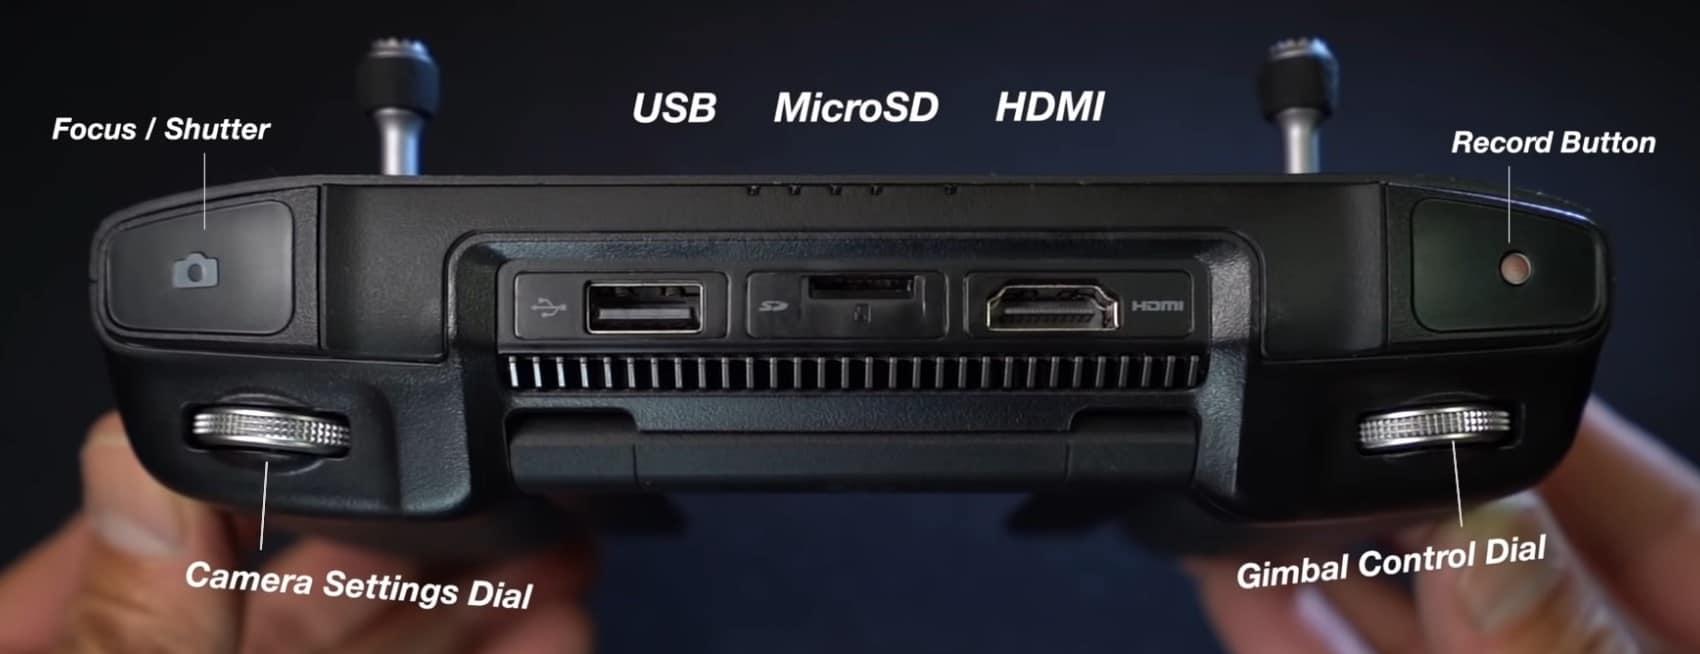 bottom-connectors.jpg